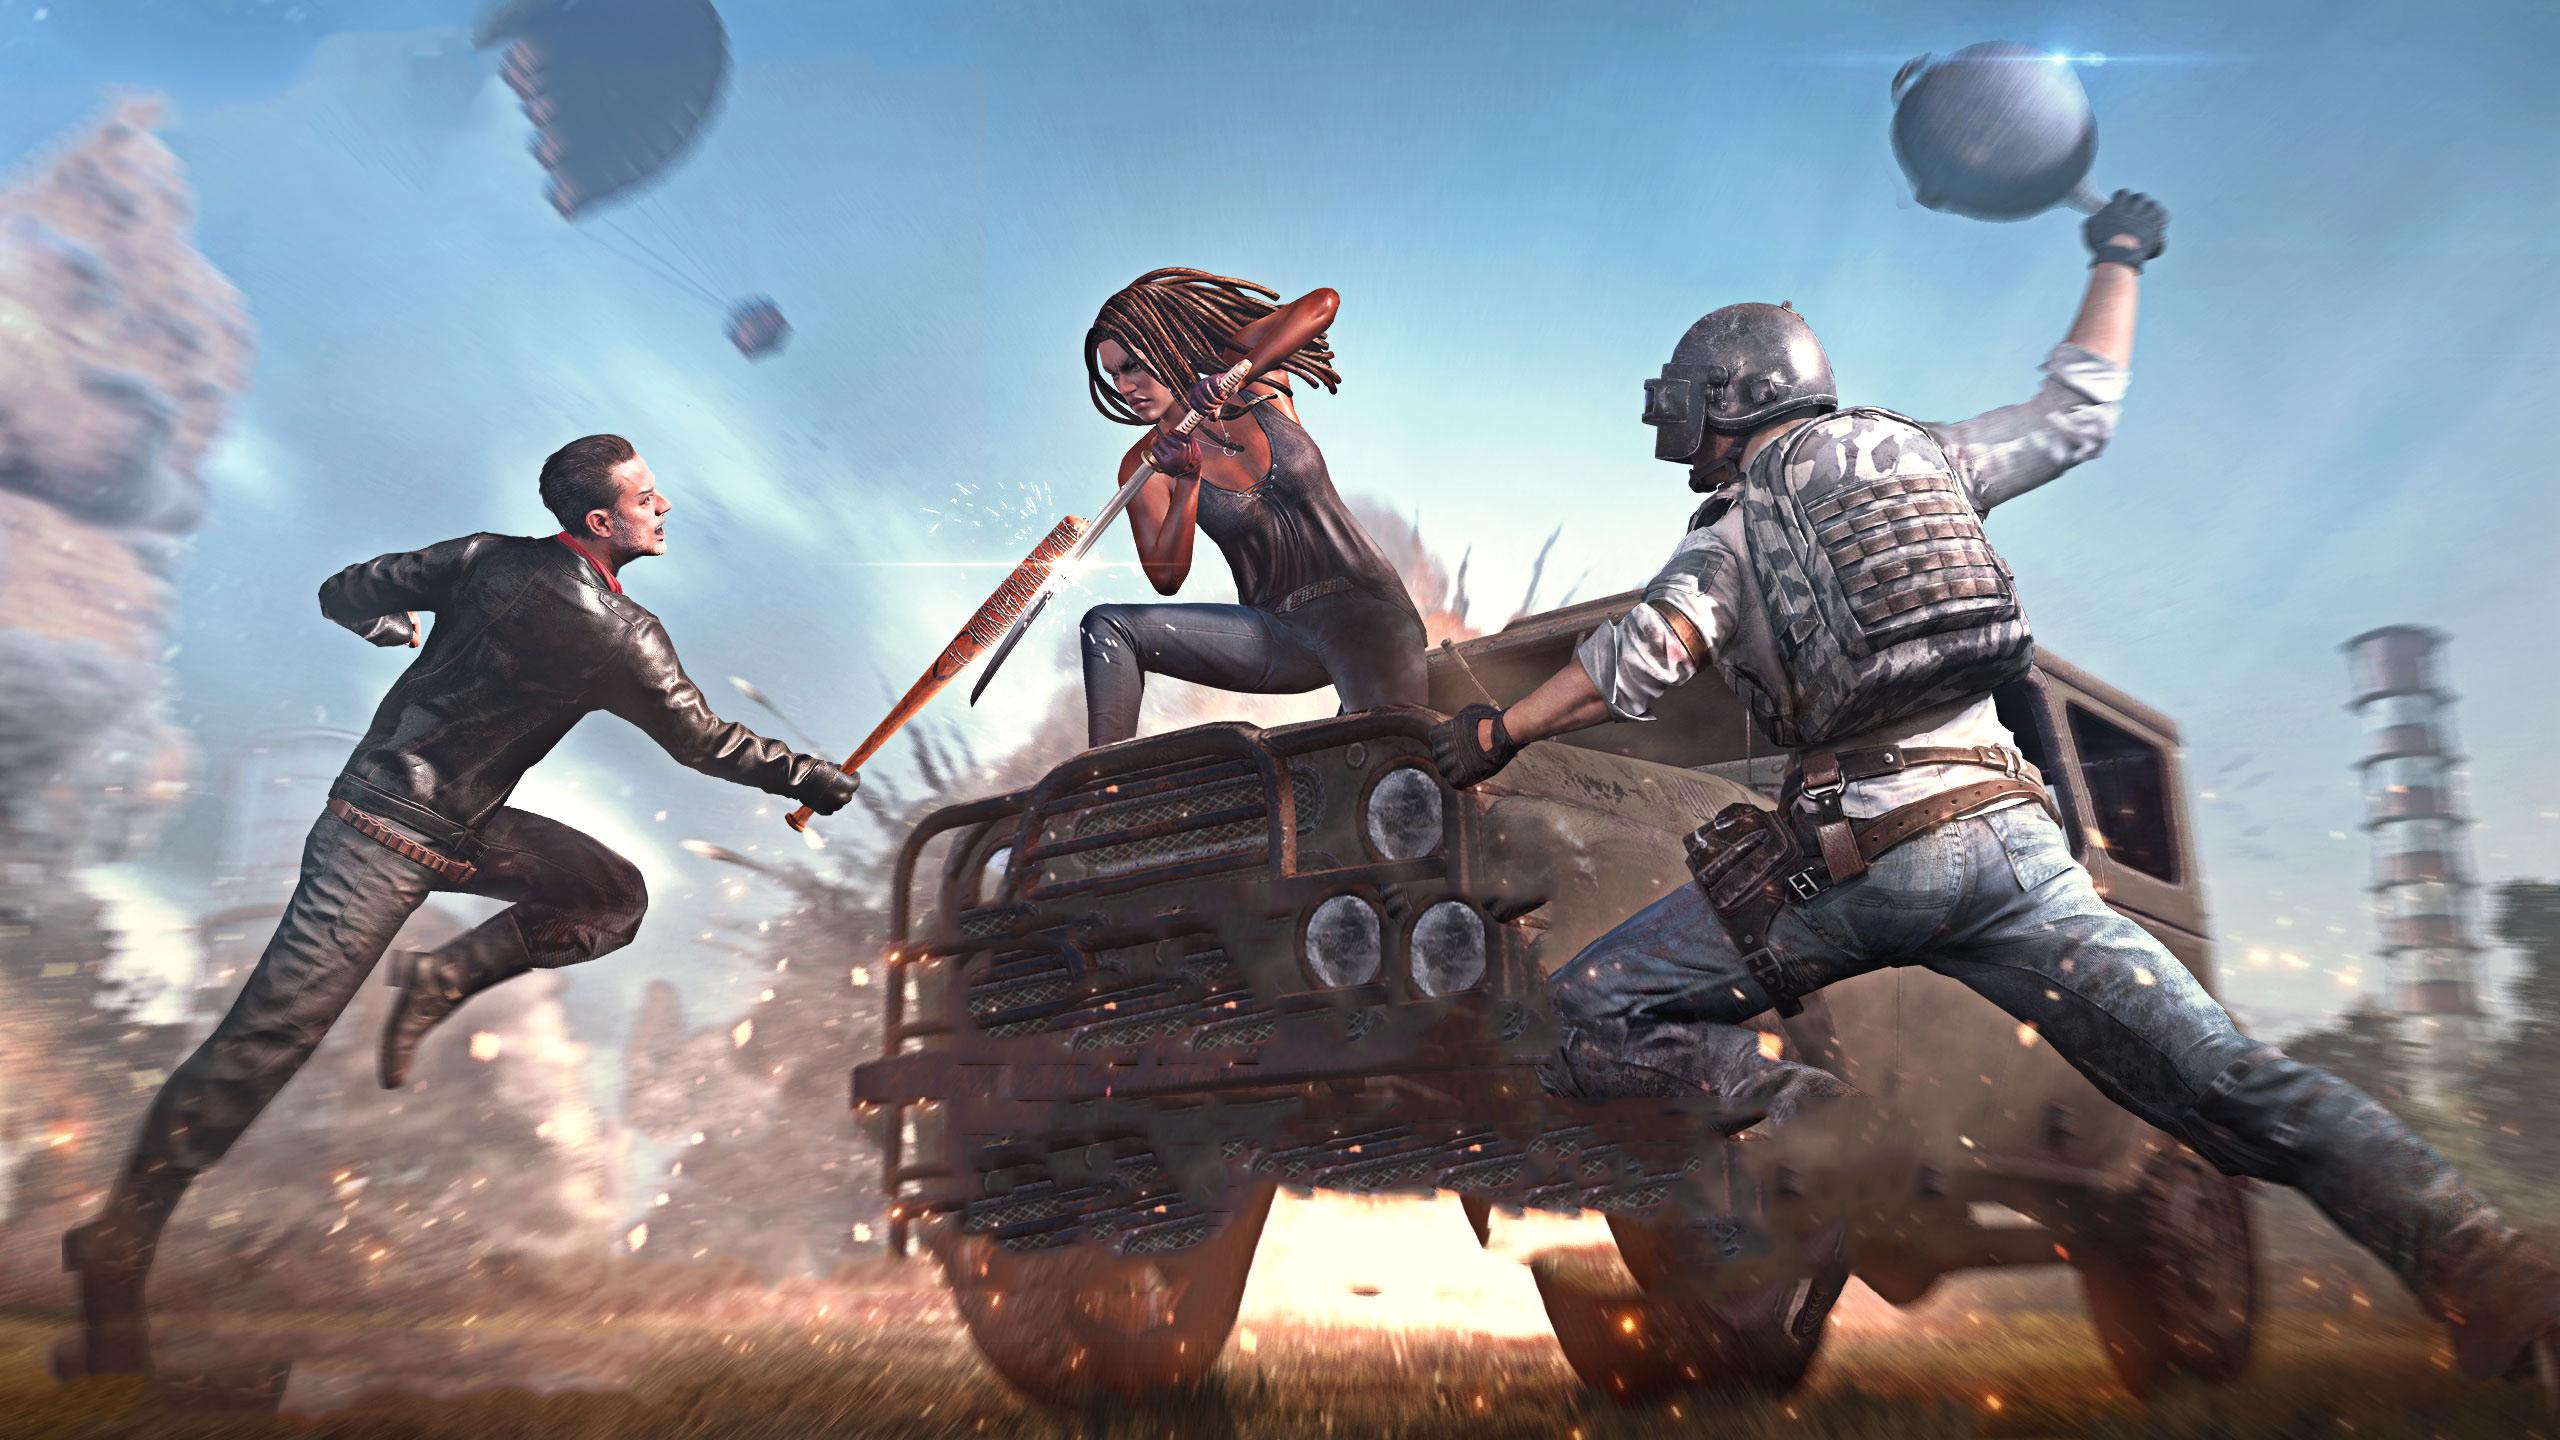 PlayerUnknown's Battlegrounds HD Wallpaper | Background Image | 2560x1440 |  ID:1056423 - Wallpaper Abyss